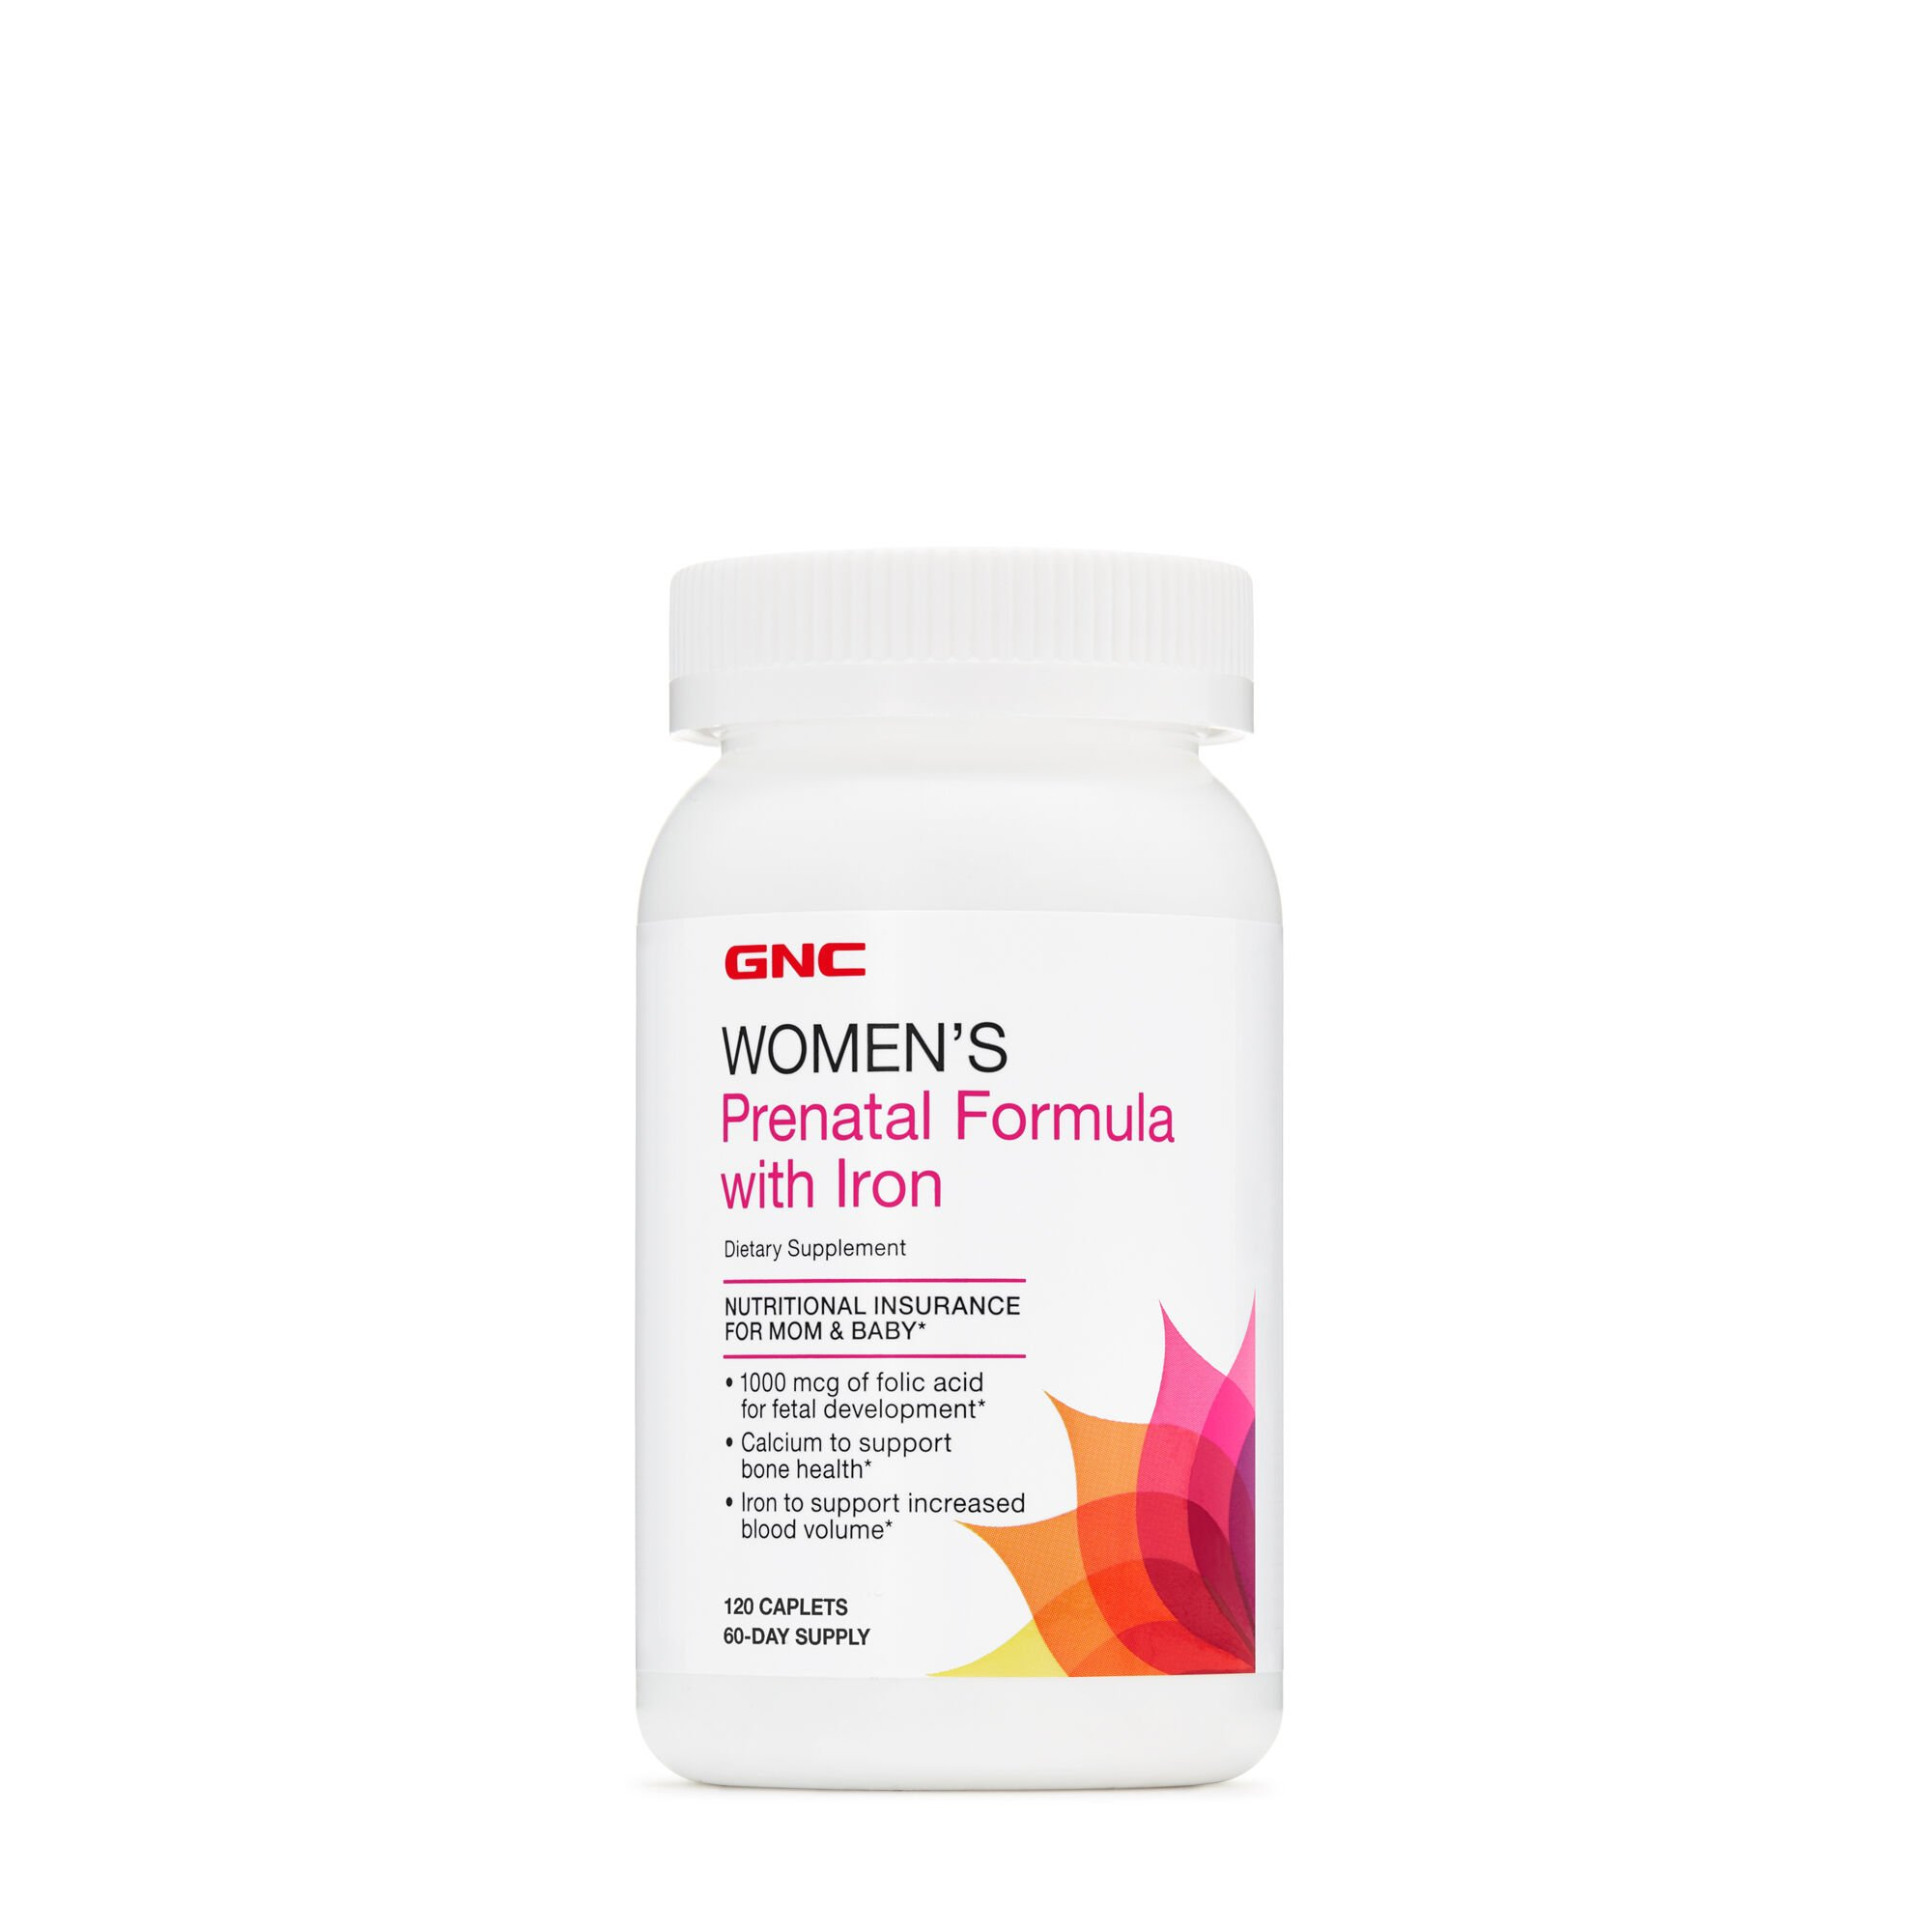 Women's Prenatal Formula with Iron